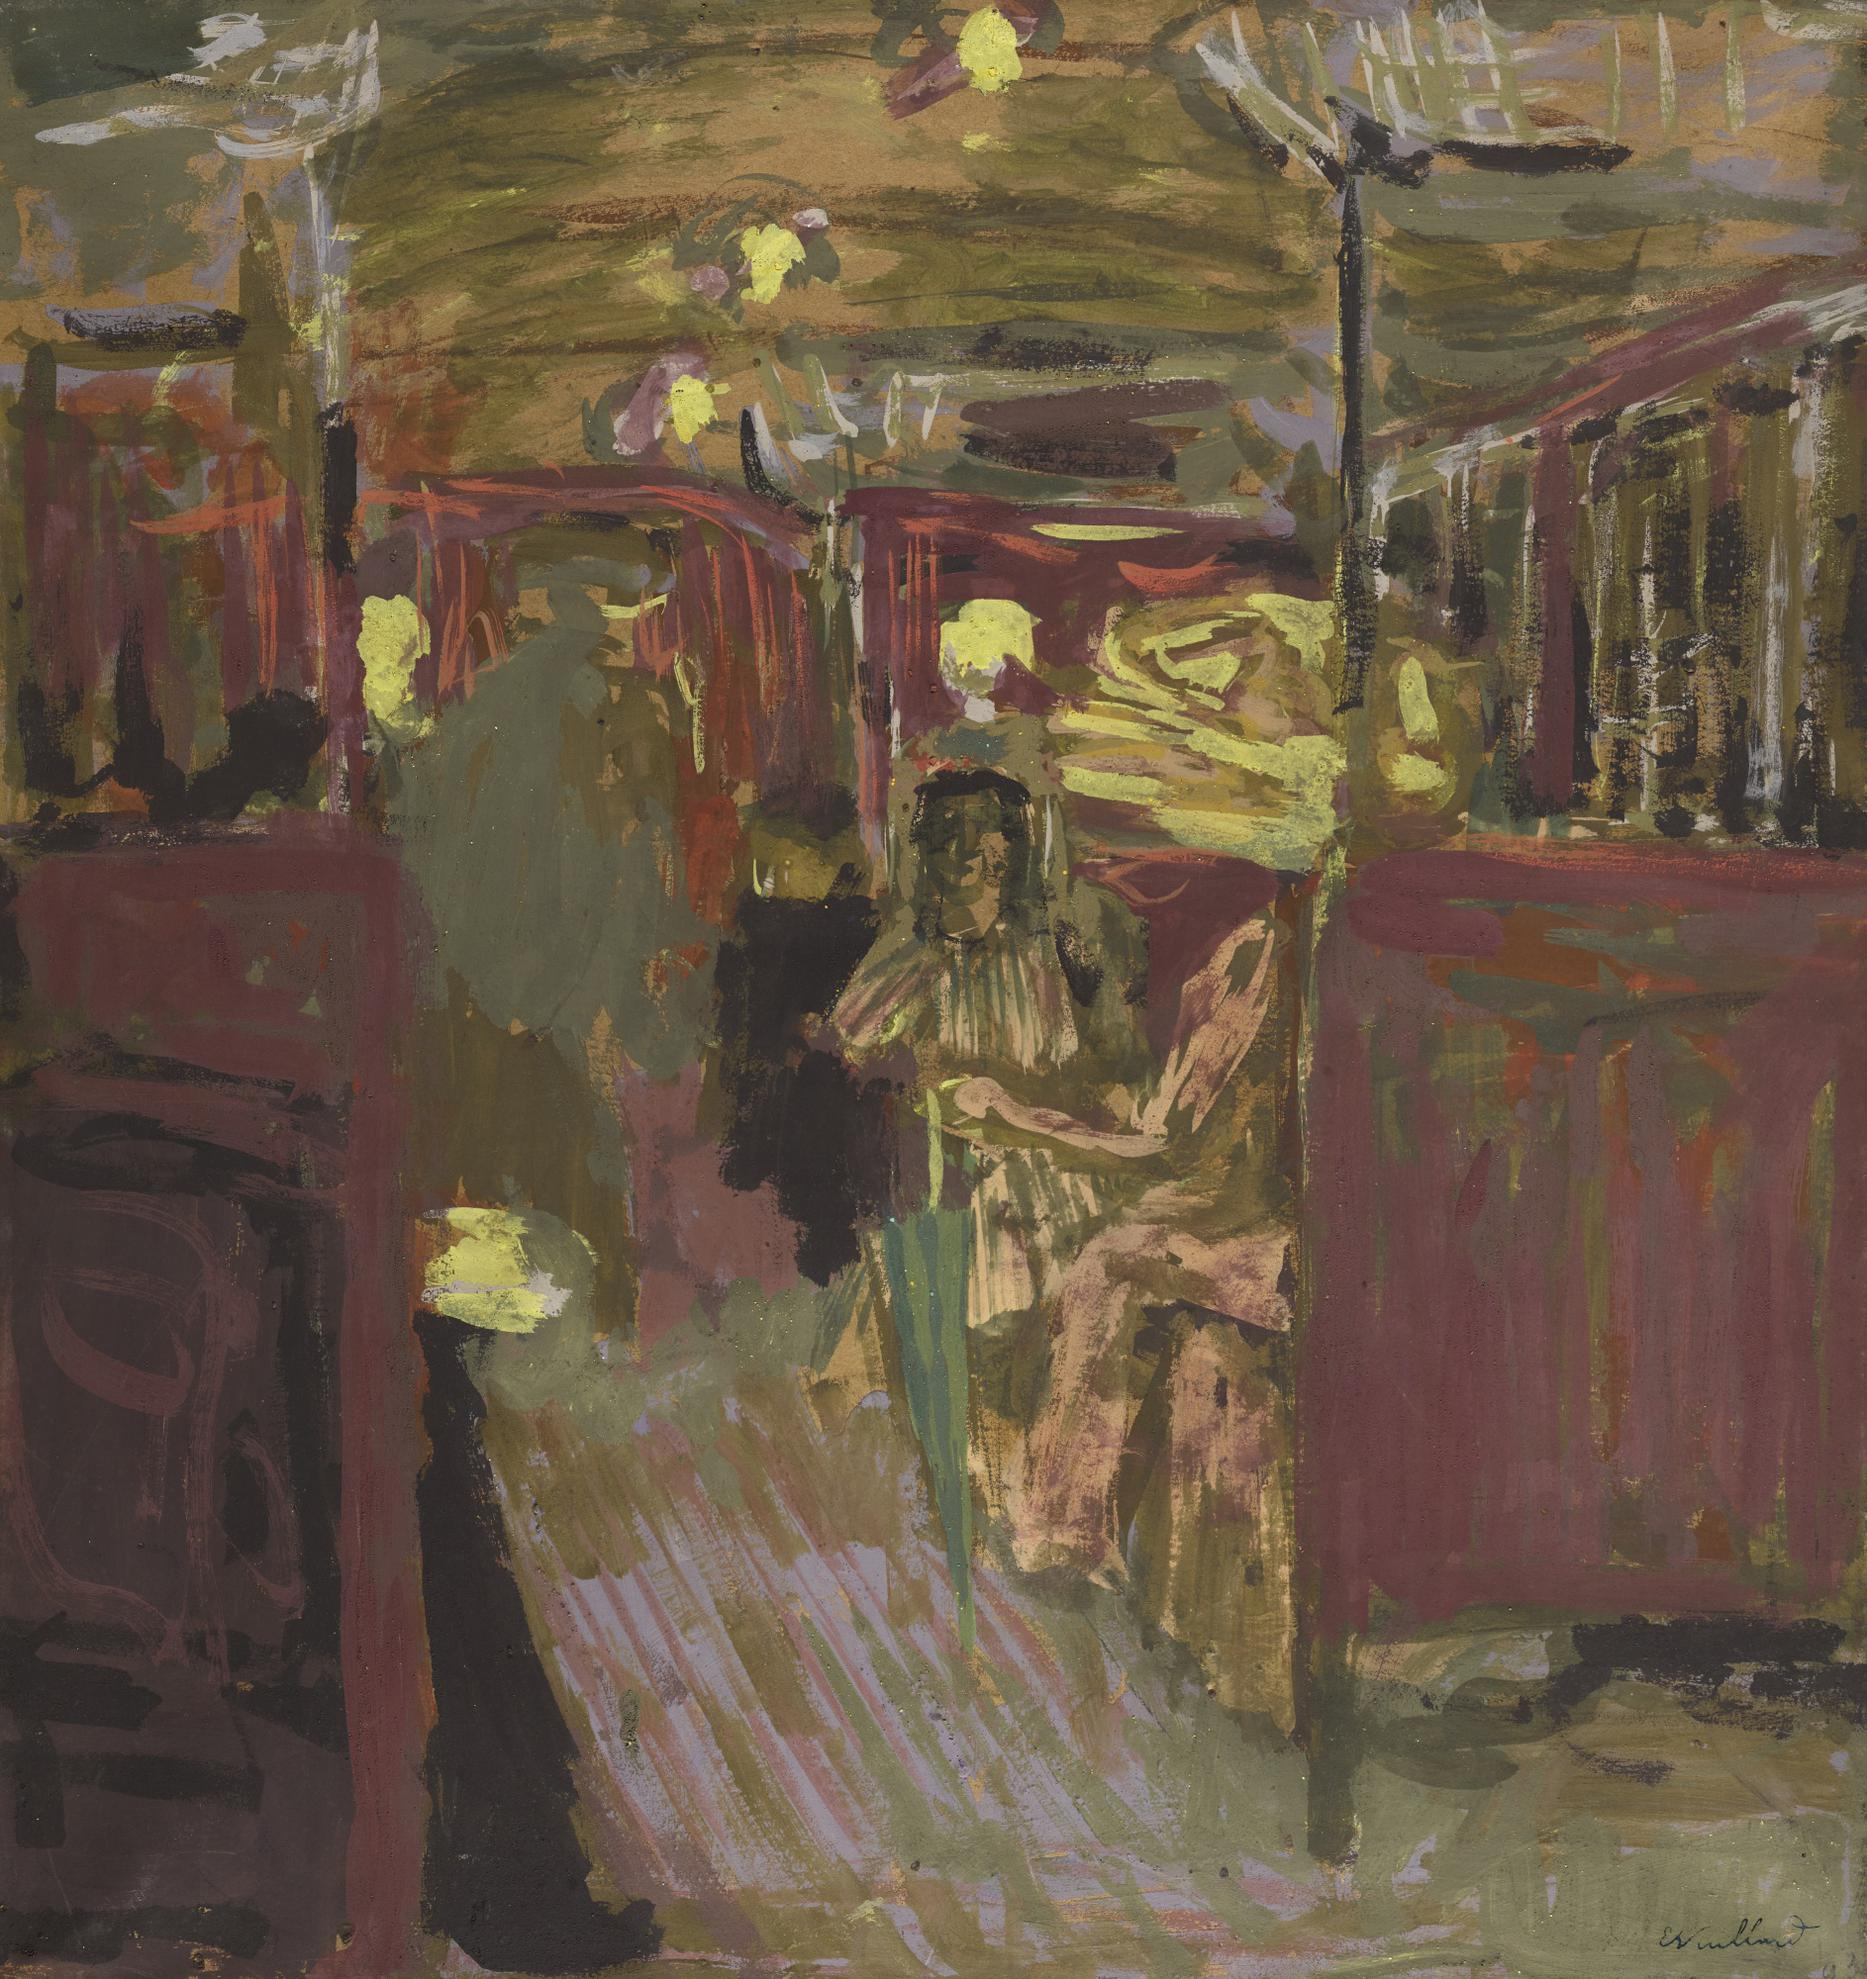 Edouard Vuillard-Le Wagon De Metro I-1909